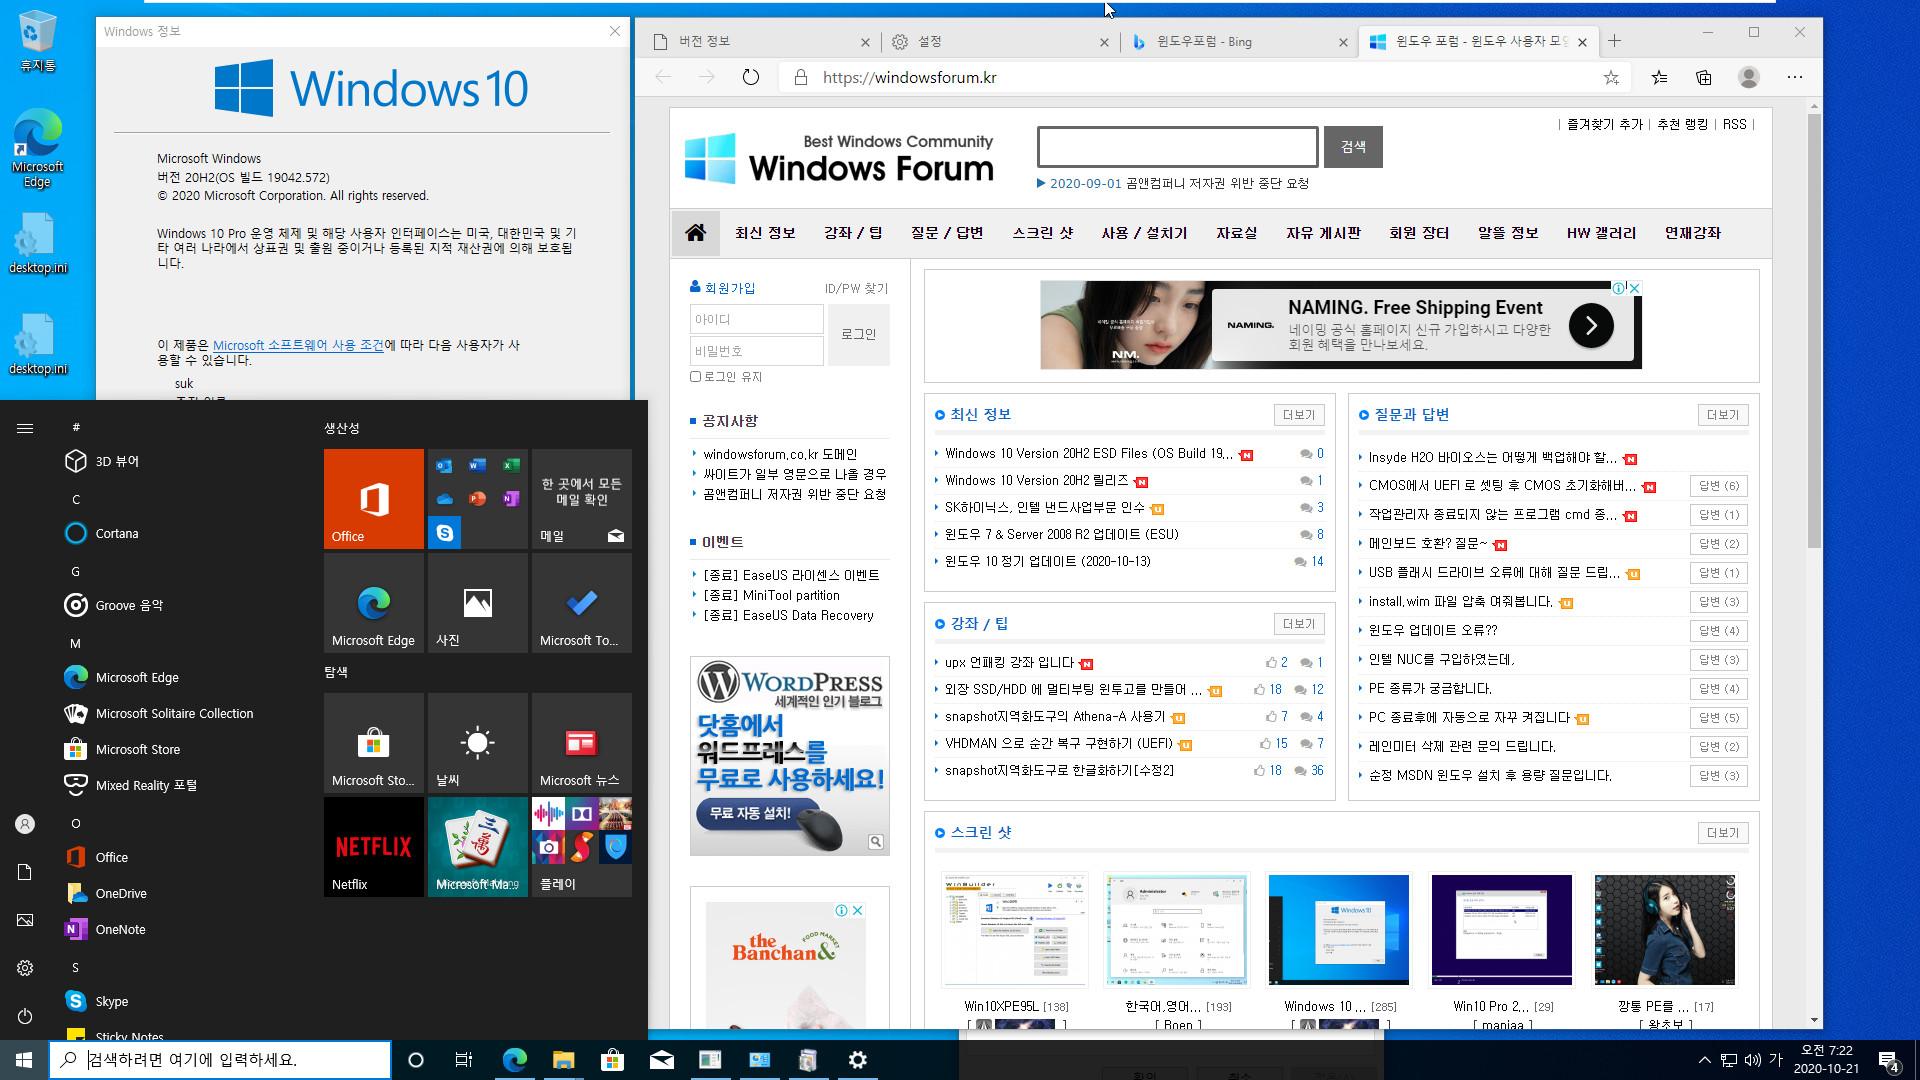 Windows 10 버전 2009 (20H2) 정식 출시되었네요 - MSDN은 19042.508 빌드 9월 정기 업데이트인데, ms 홈페이지는 19042.572 빌드 10월 정기 업데이트네요 - 다운로드하고 윈도우 설치하여 확인해봅니다 2020-10-21_072254.jpg